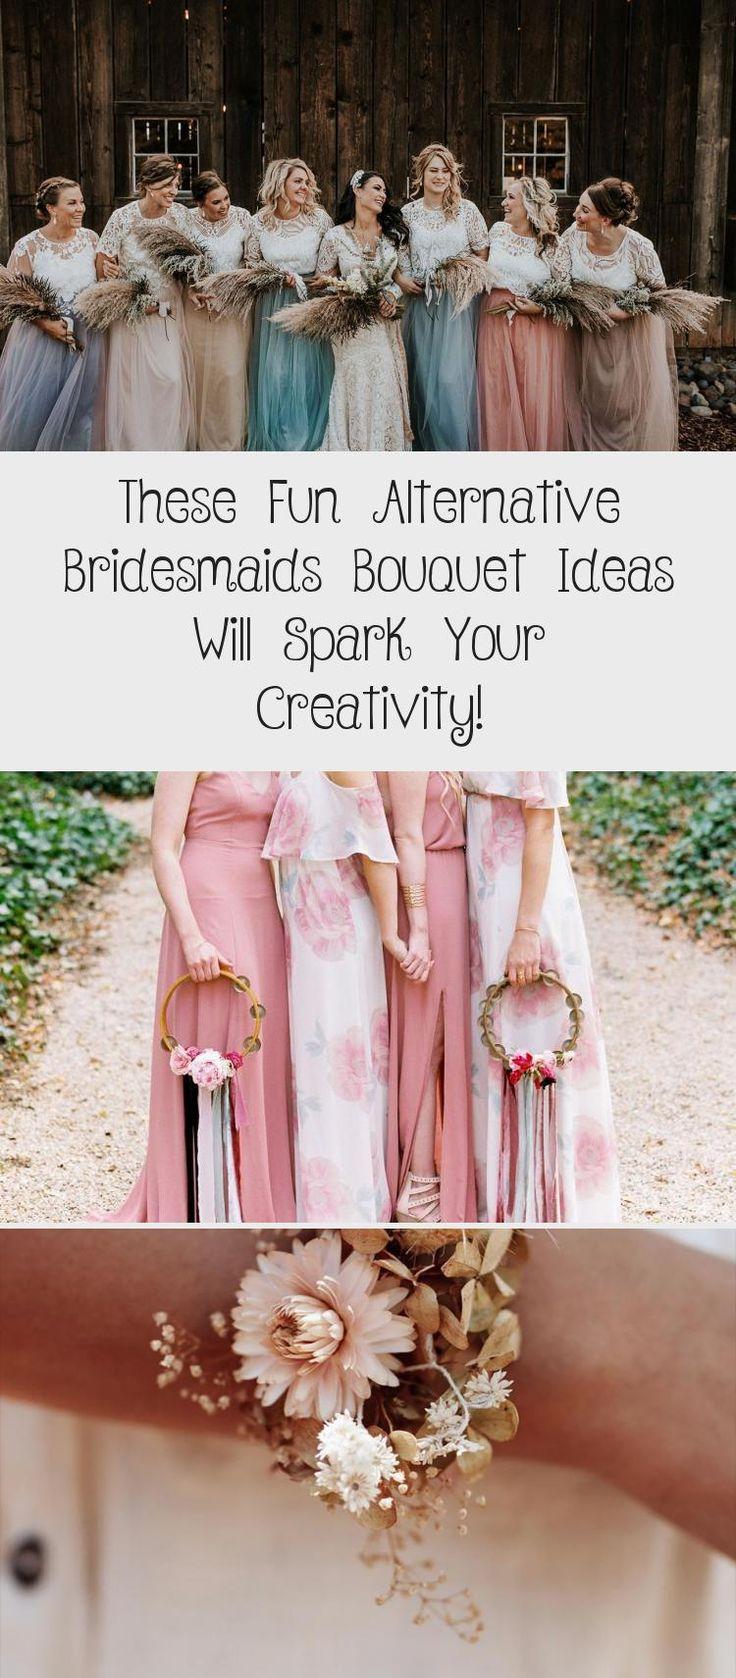 These Fun Alternative Bridesmaids Bouquet Ideas Will Spark Your Creativity! - Green Wedding Shoes